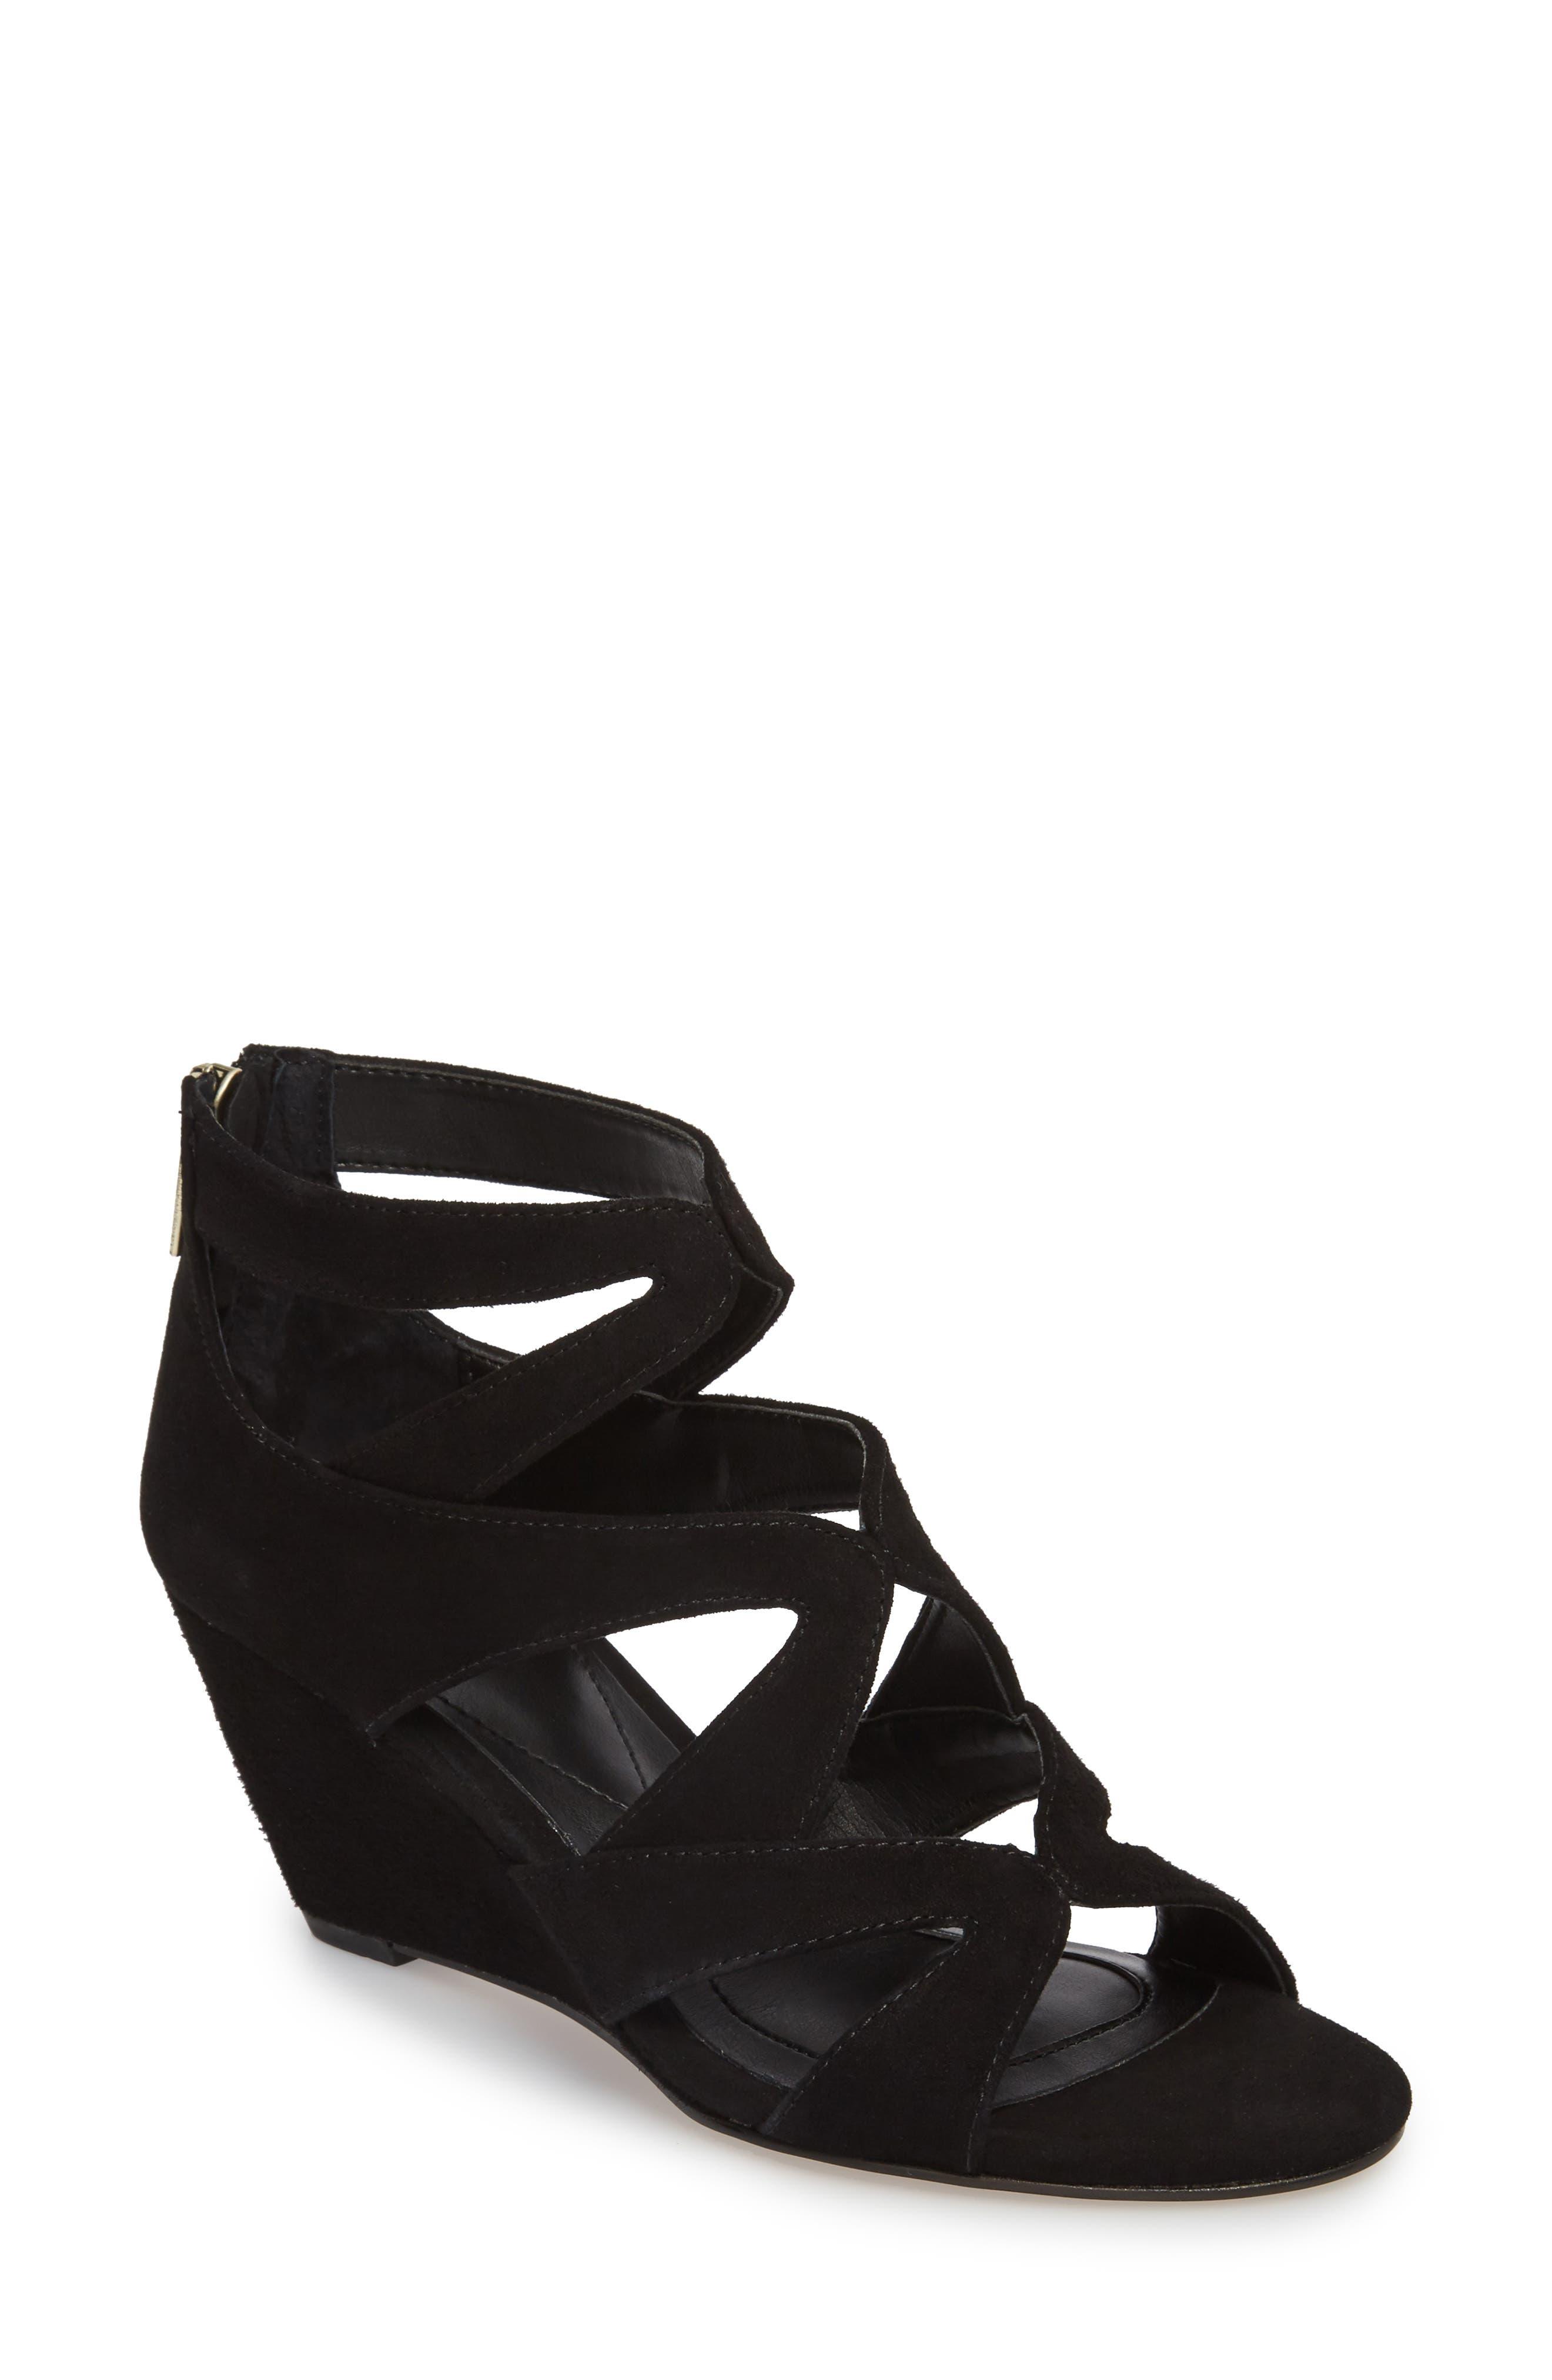 Filisha Wedge Sandal,                         Main,                         color, BLACK SUEDE